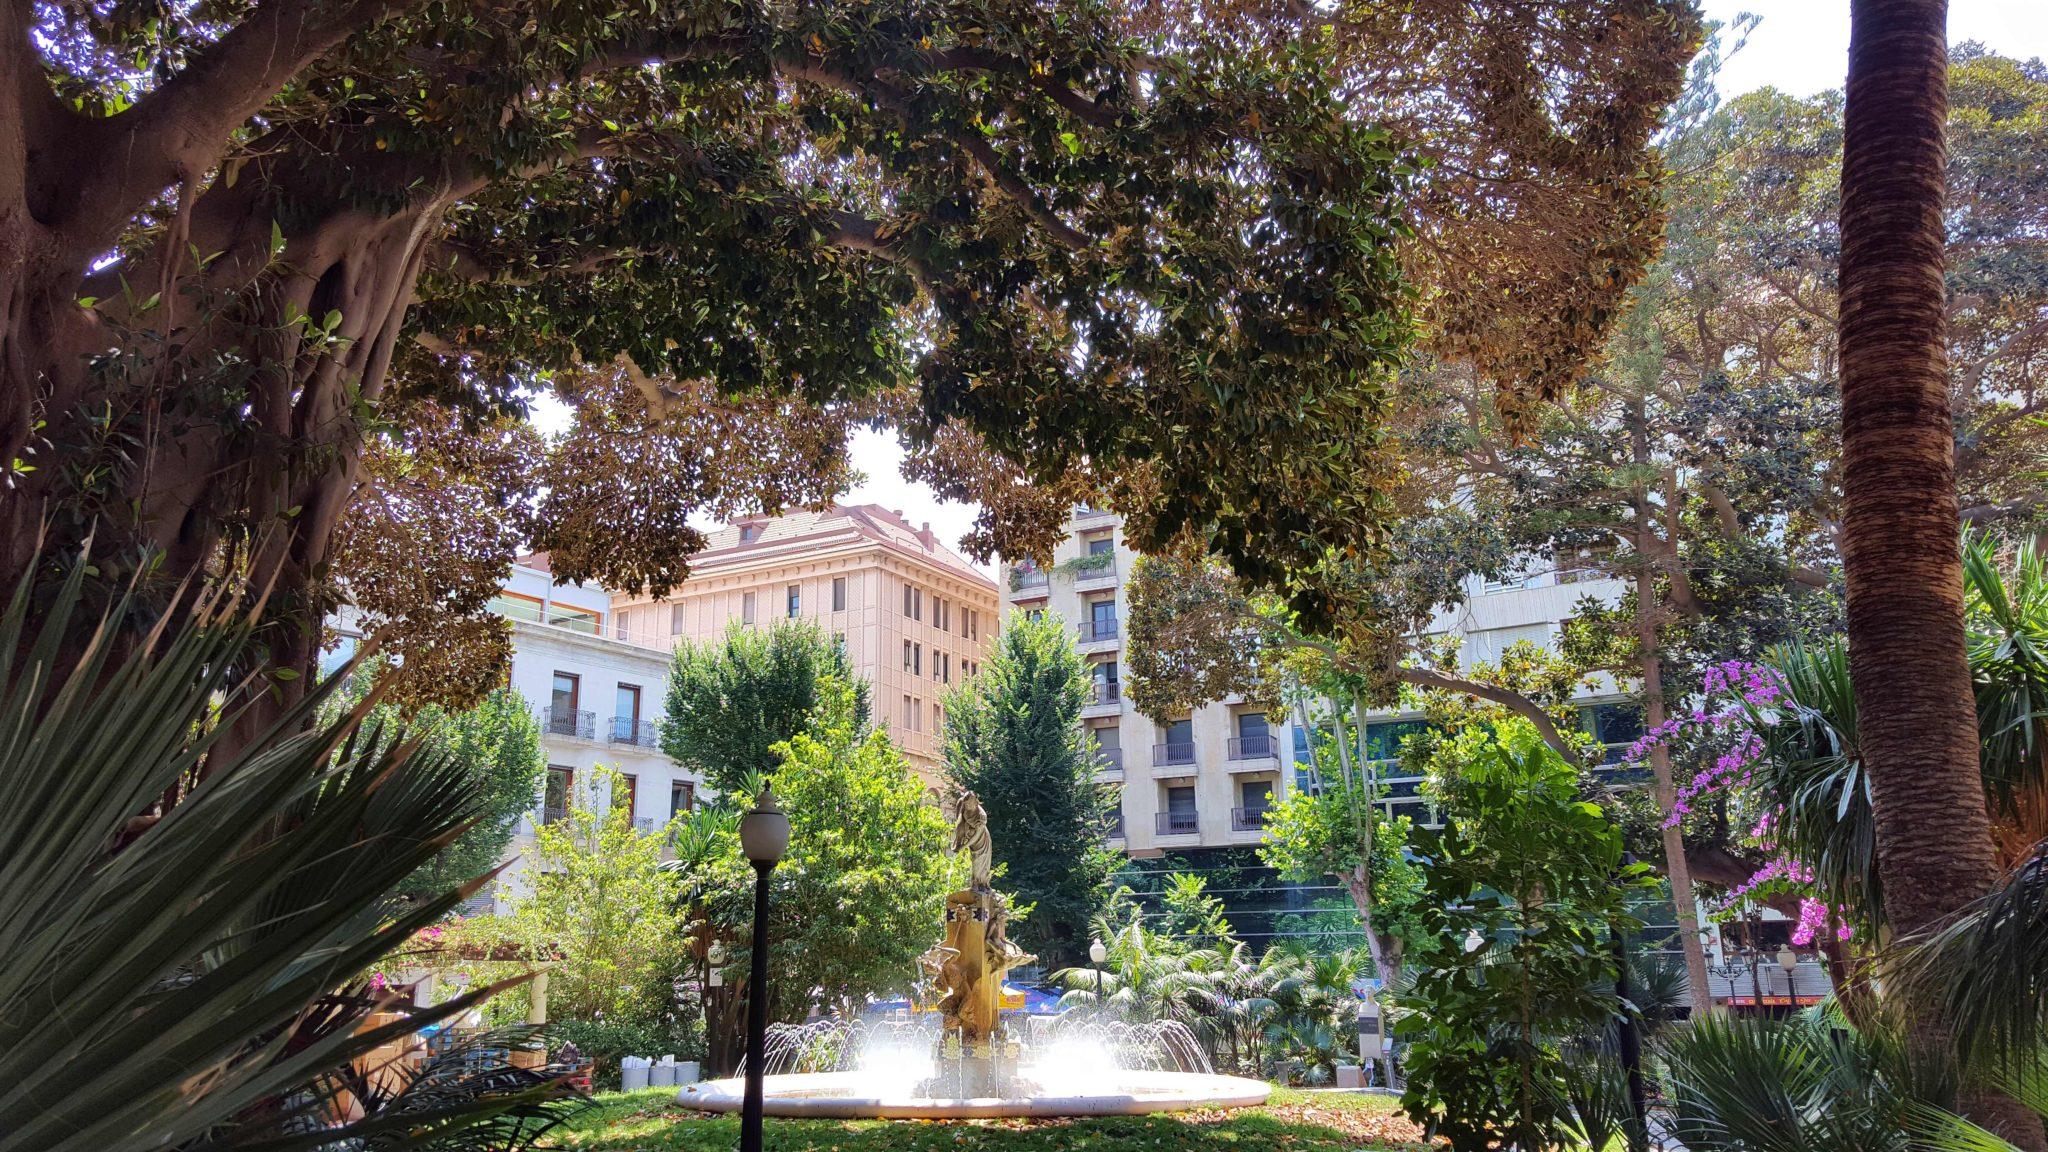 Plaza Gabriel Miró - Alicante - Espanha © Viaje Comigo